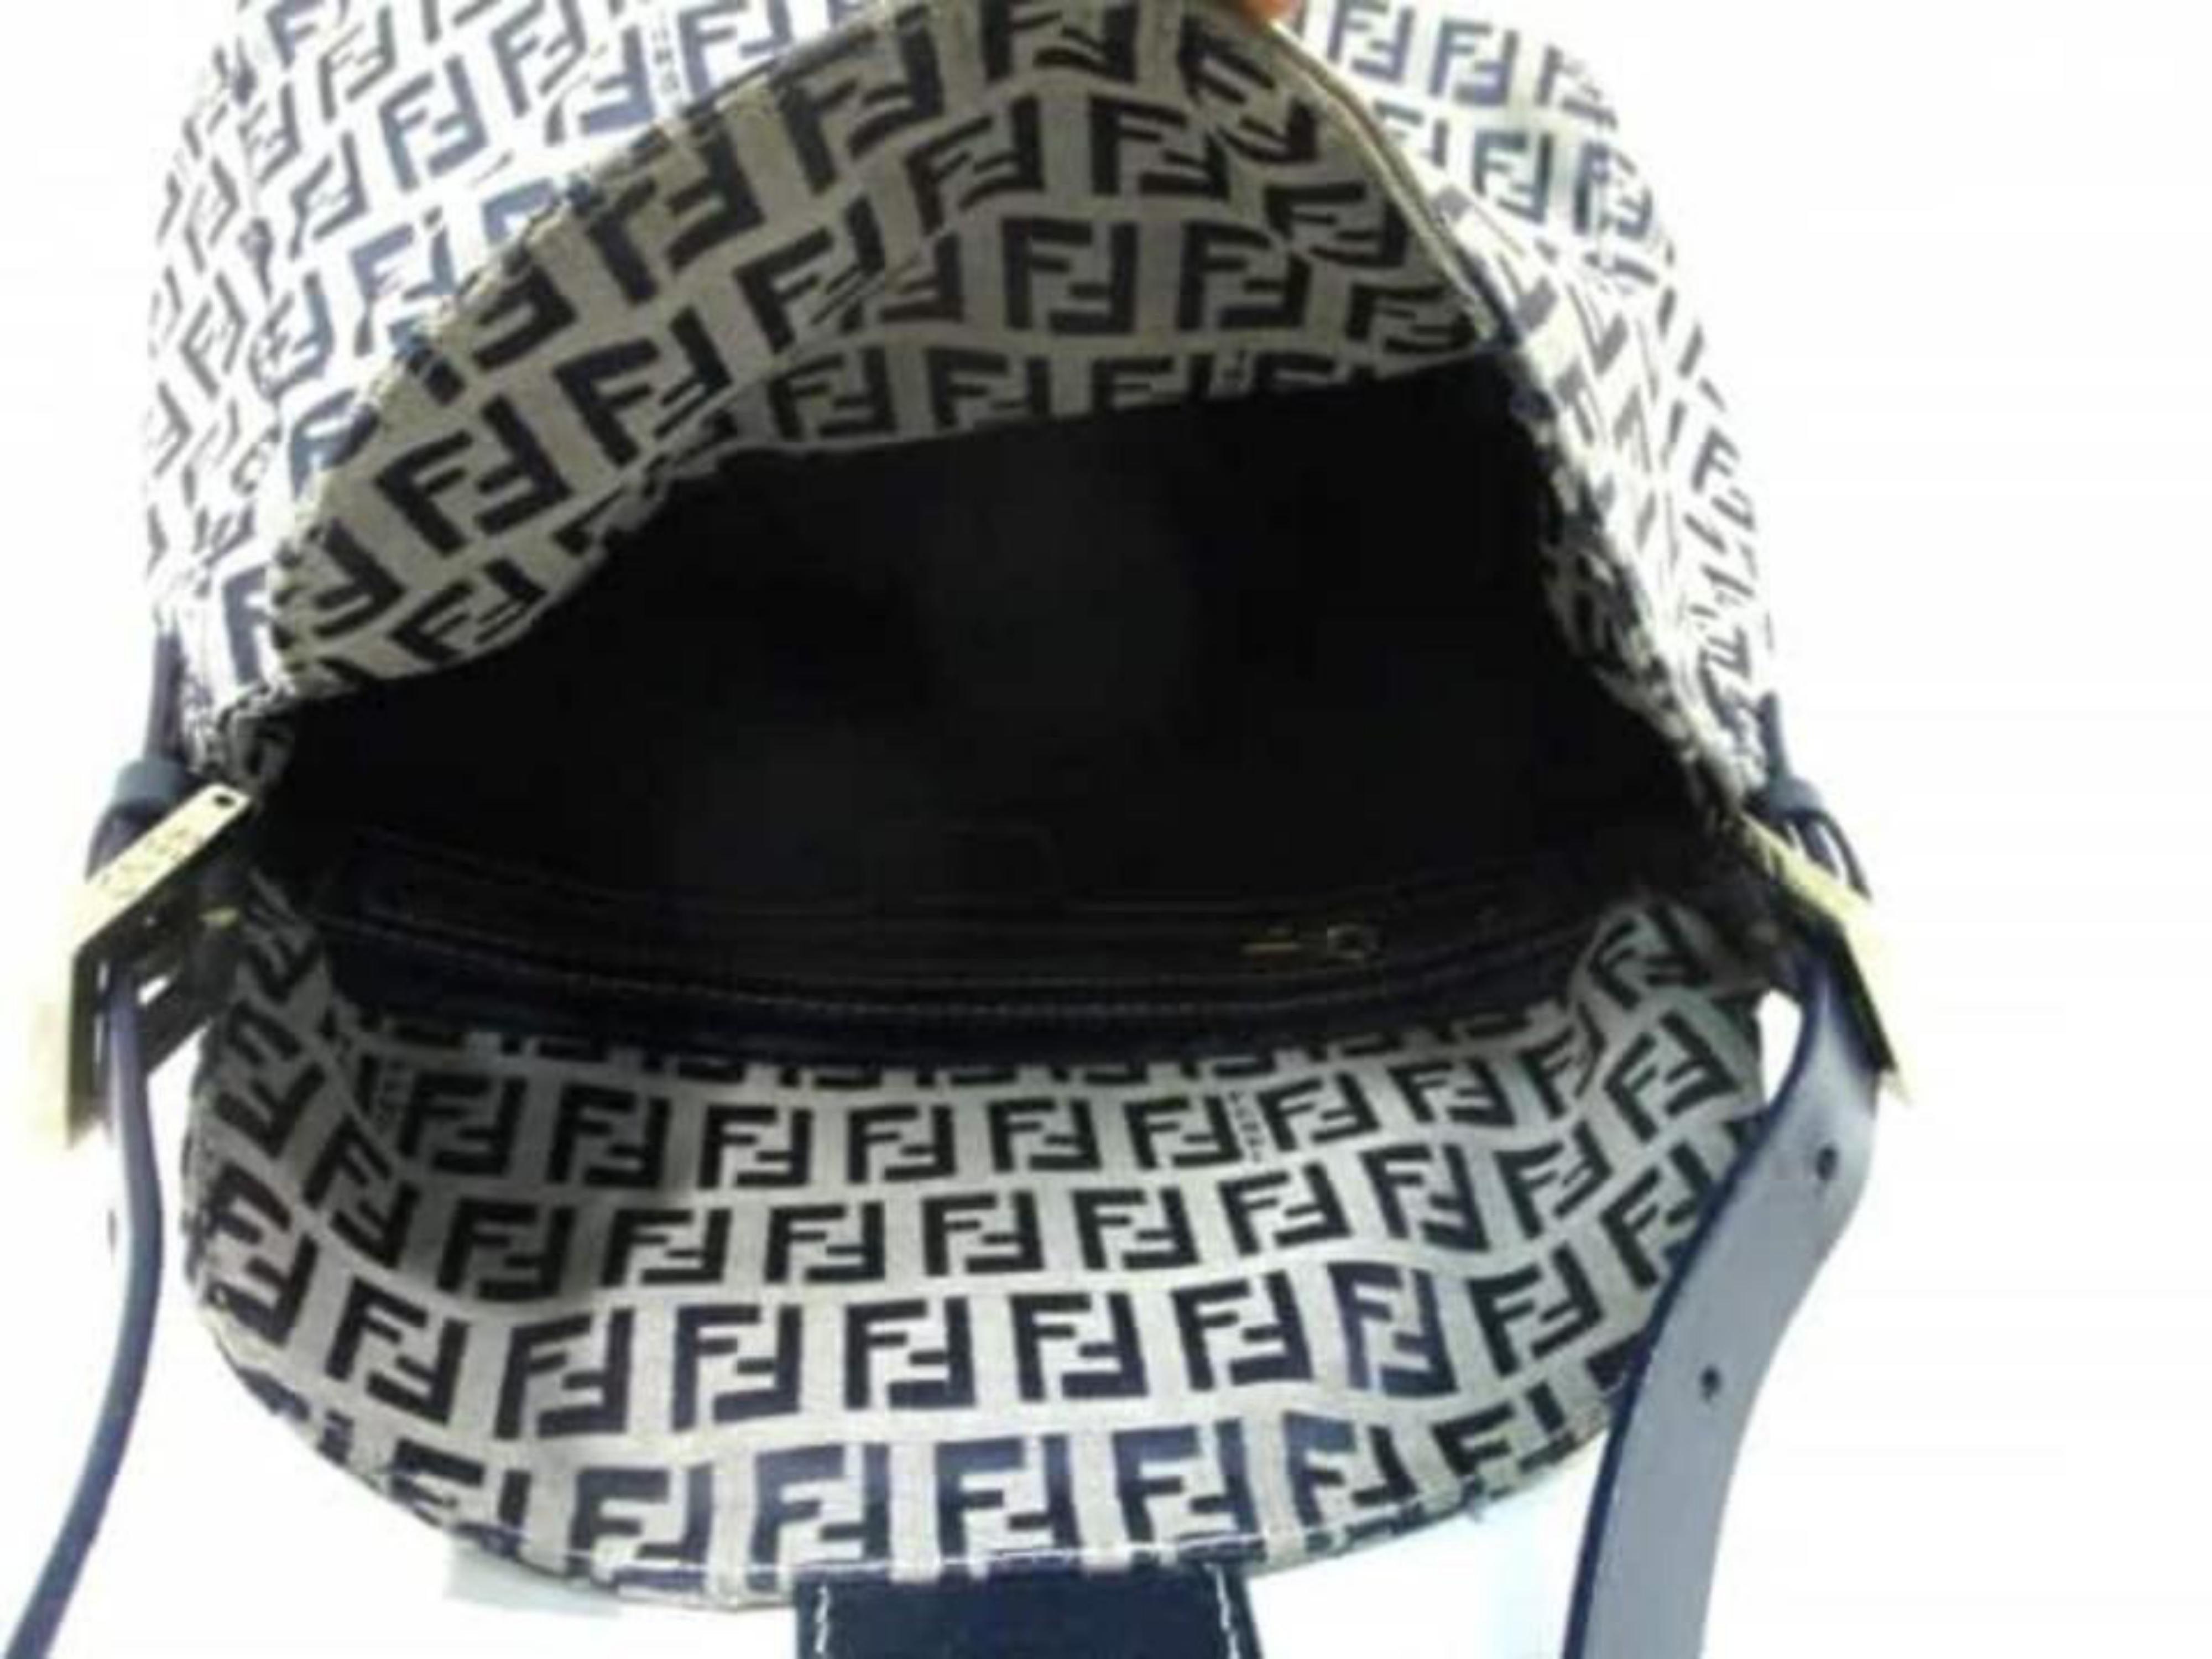 742a825816b Fendi Monogram Ff Mama Hobo 227991 Navy Coated Canvas Shoulder Bag at  1stdibs